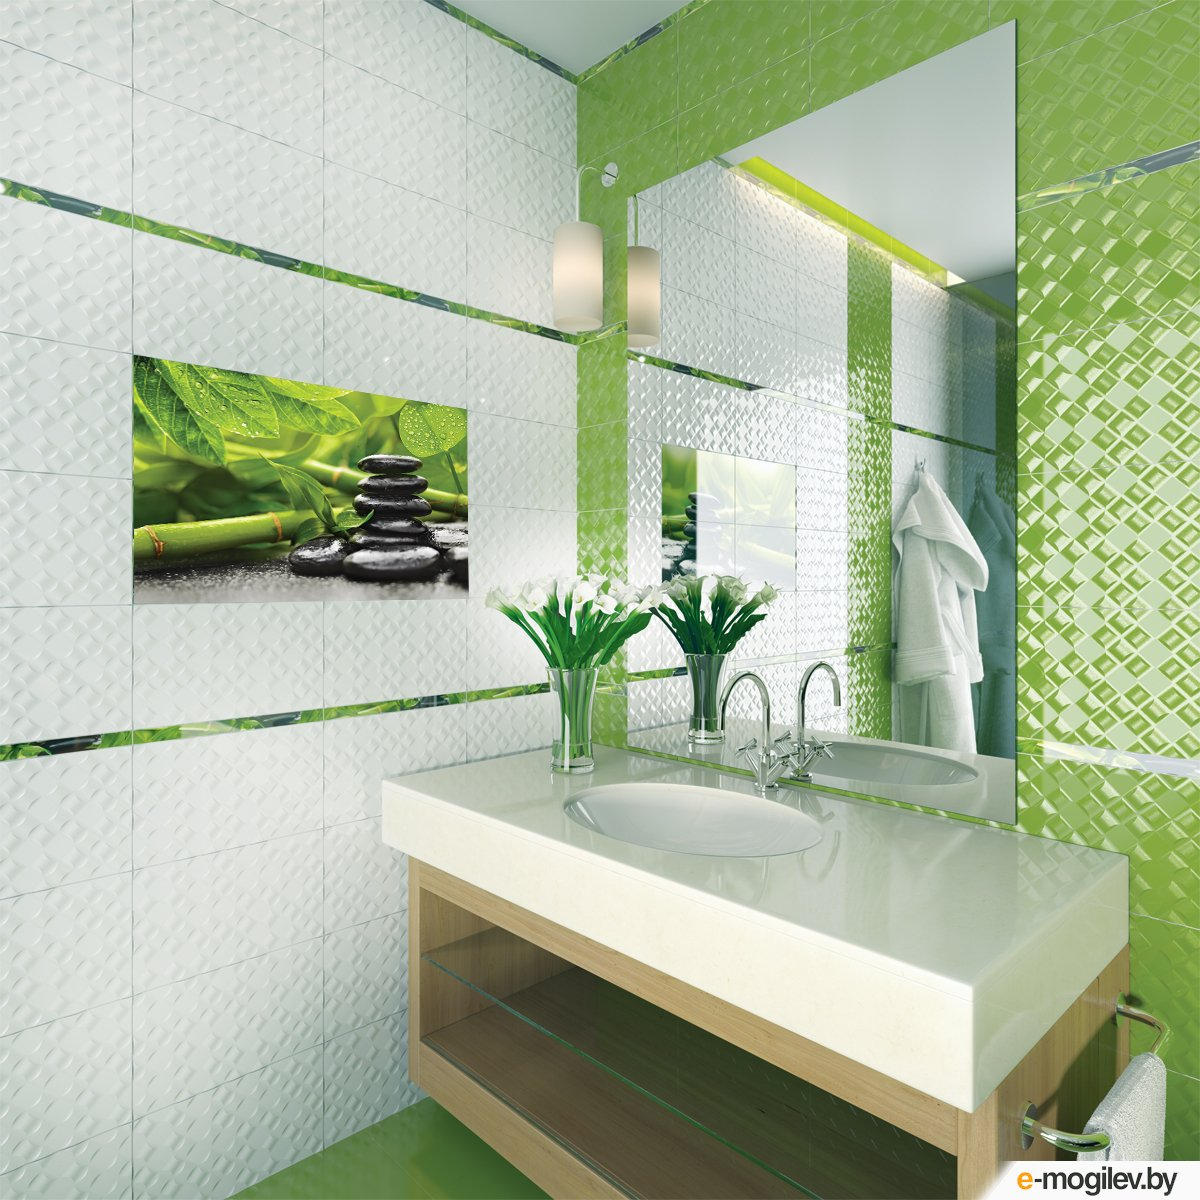 Зеленая ванная комната  № 2278694 бесплатно